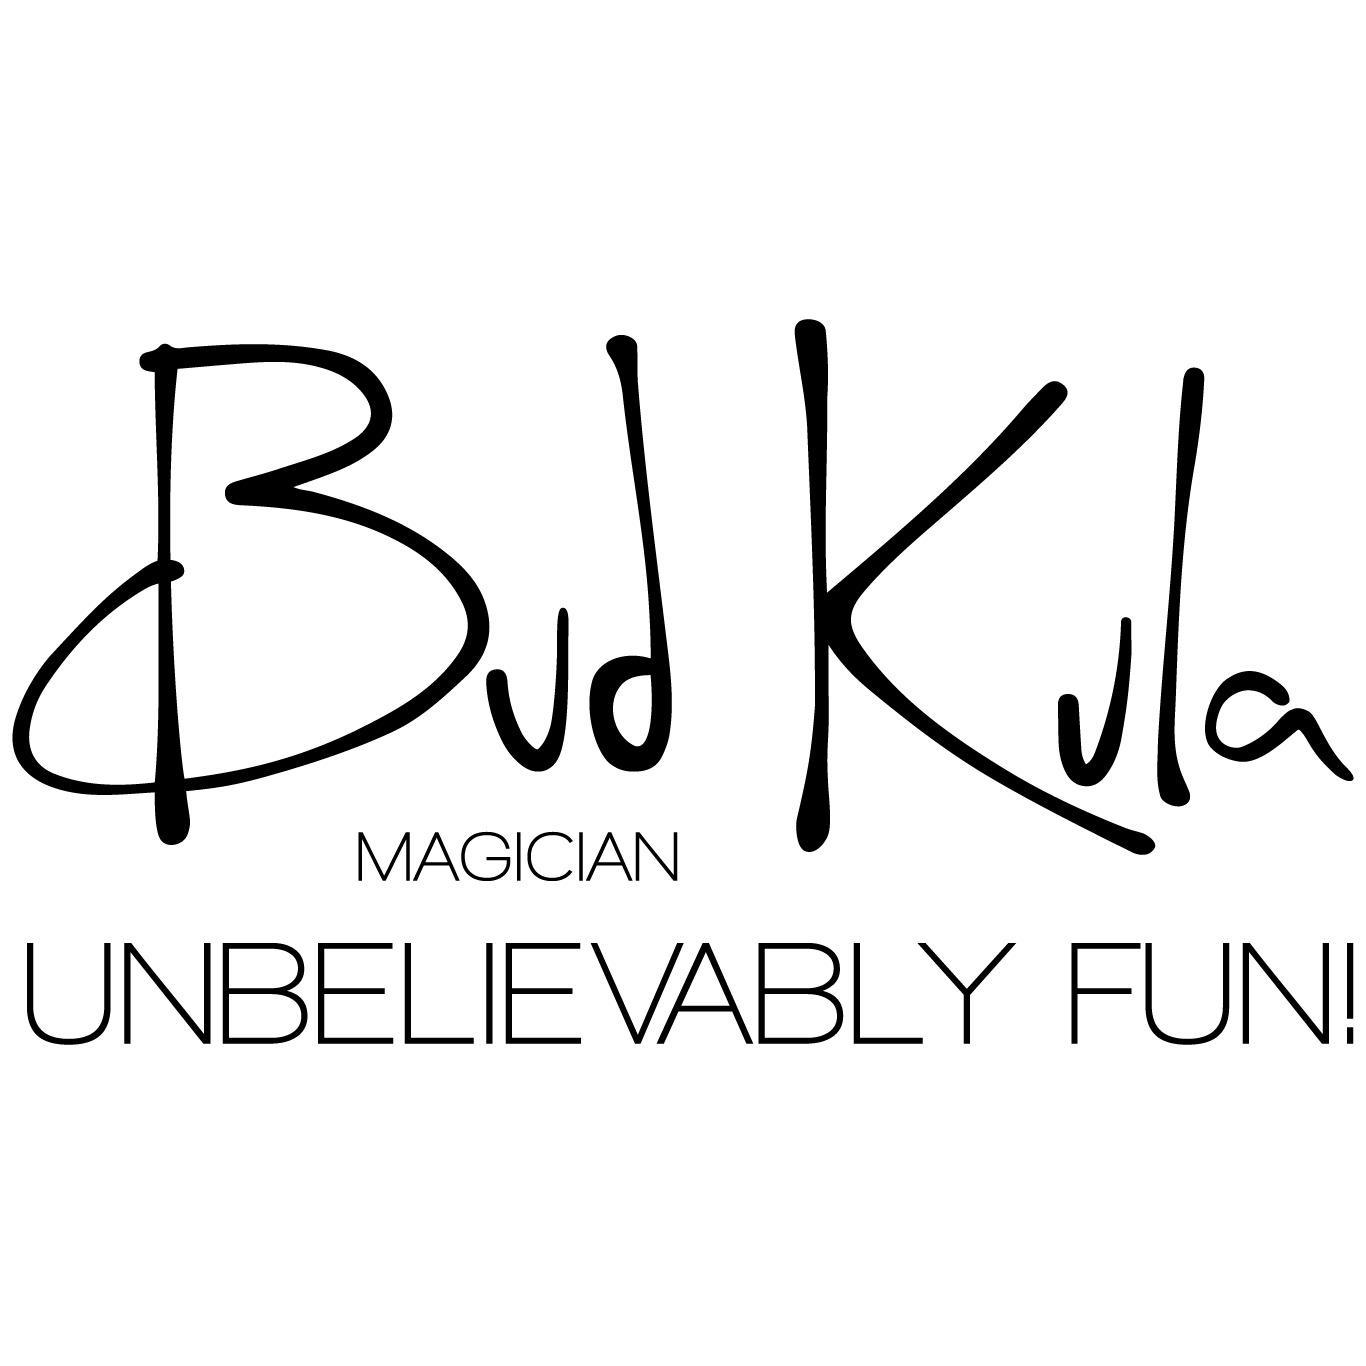 Bud Kula Magic image 5